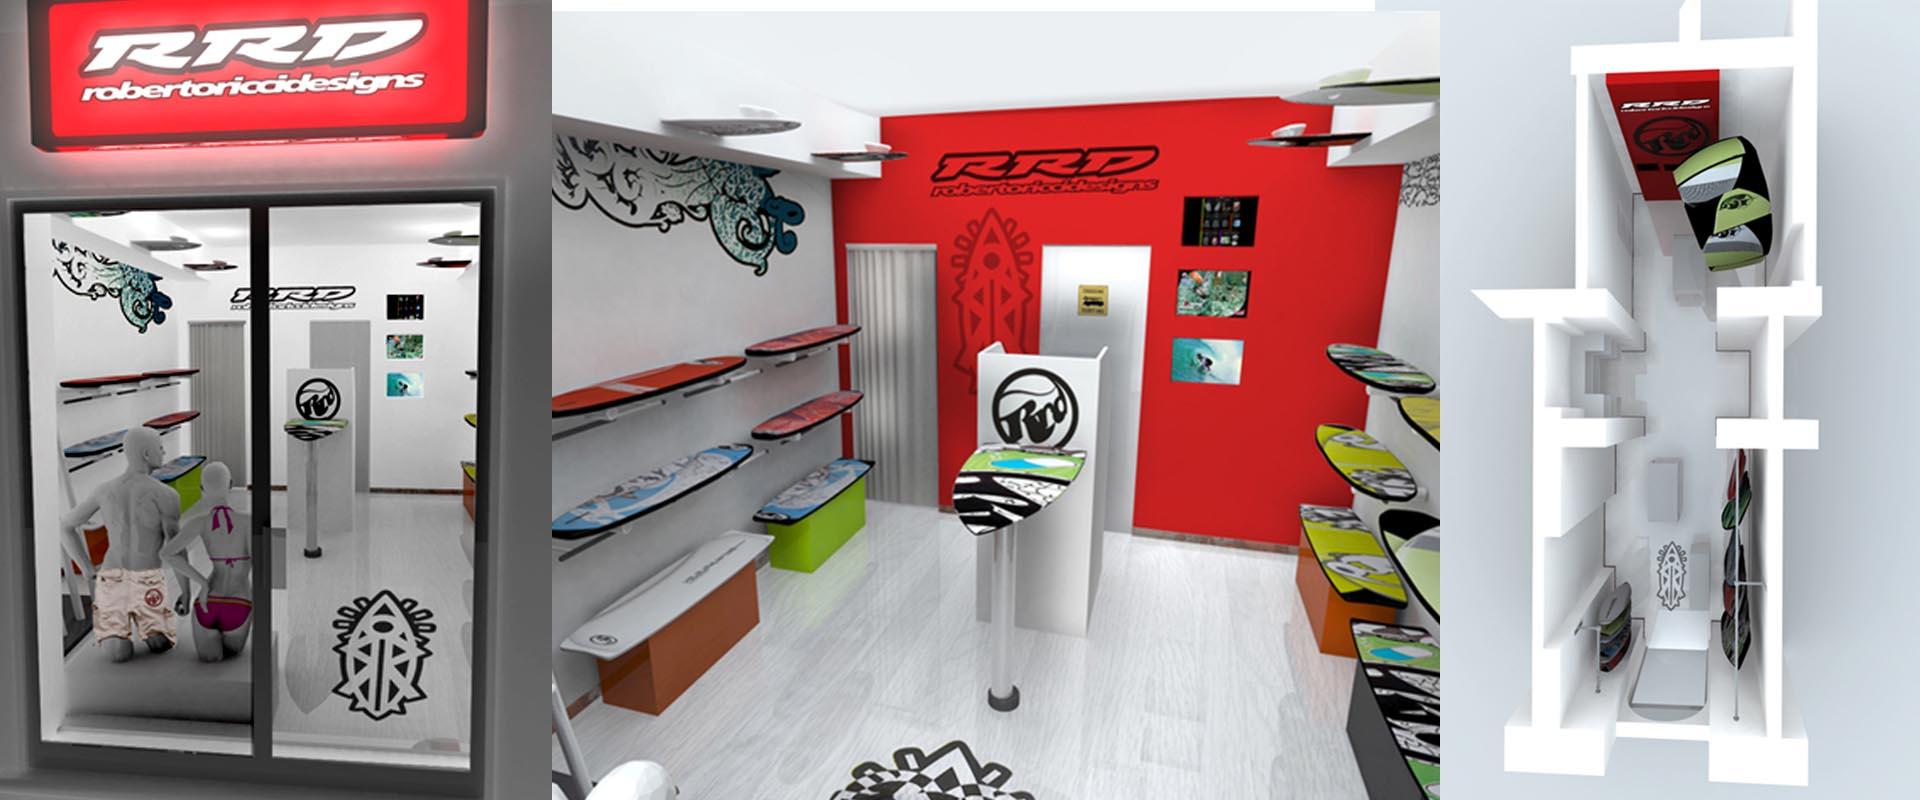 aironic_architettura_design_interior_rrd